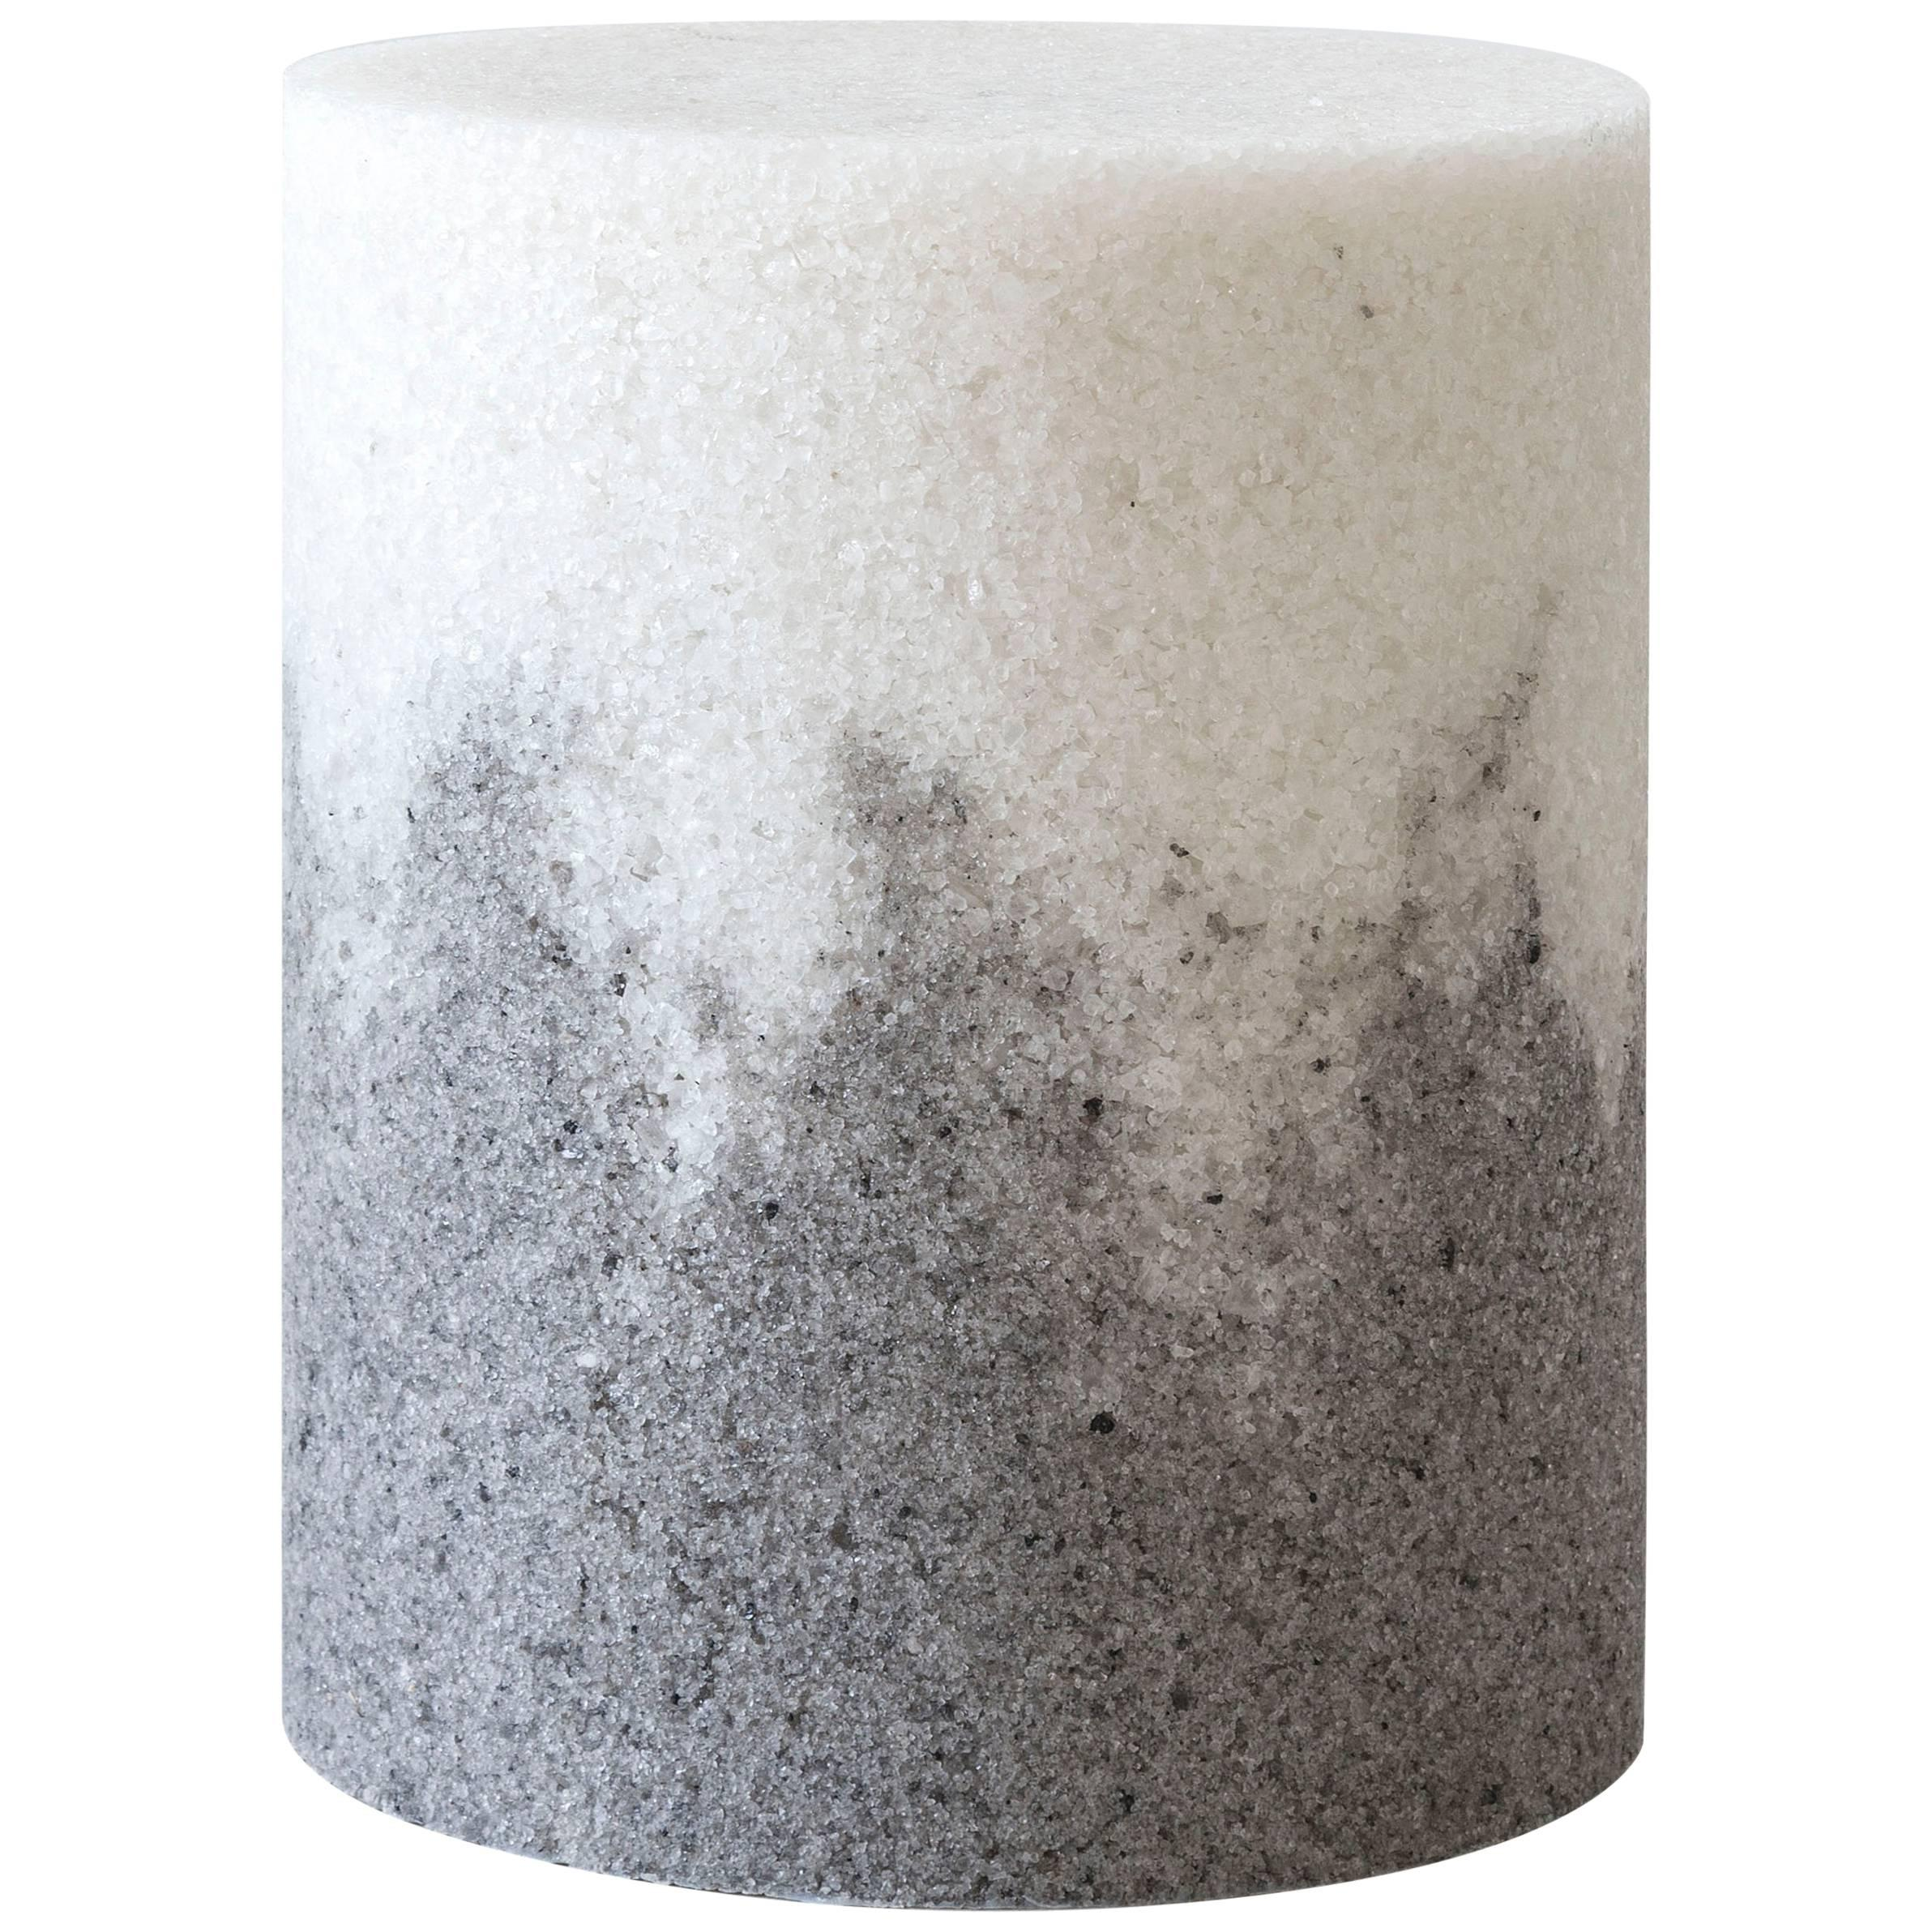 Drum, White Rock Salt and Grey Rock Salt by Fernando Mastrangelo